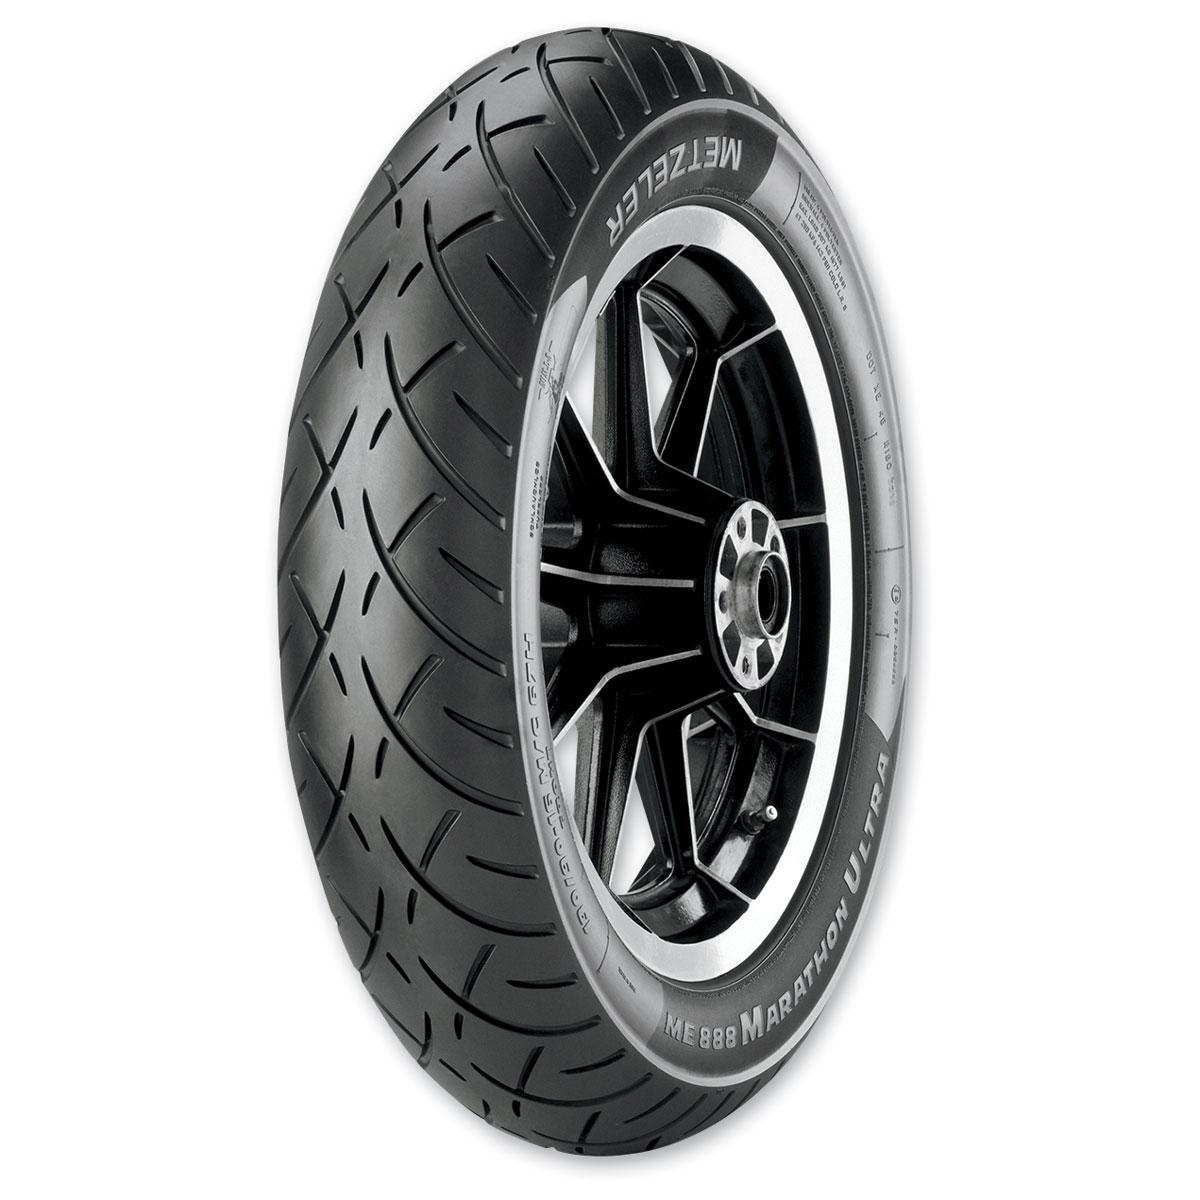 Metzeler ME888 Marathon Ultra 140/75R17 Front Tire